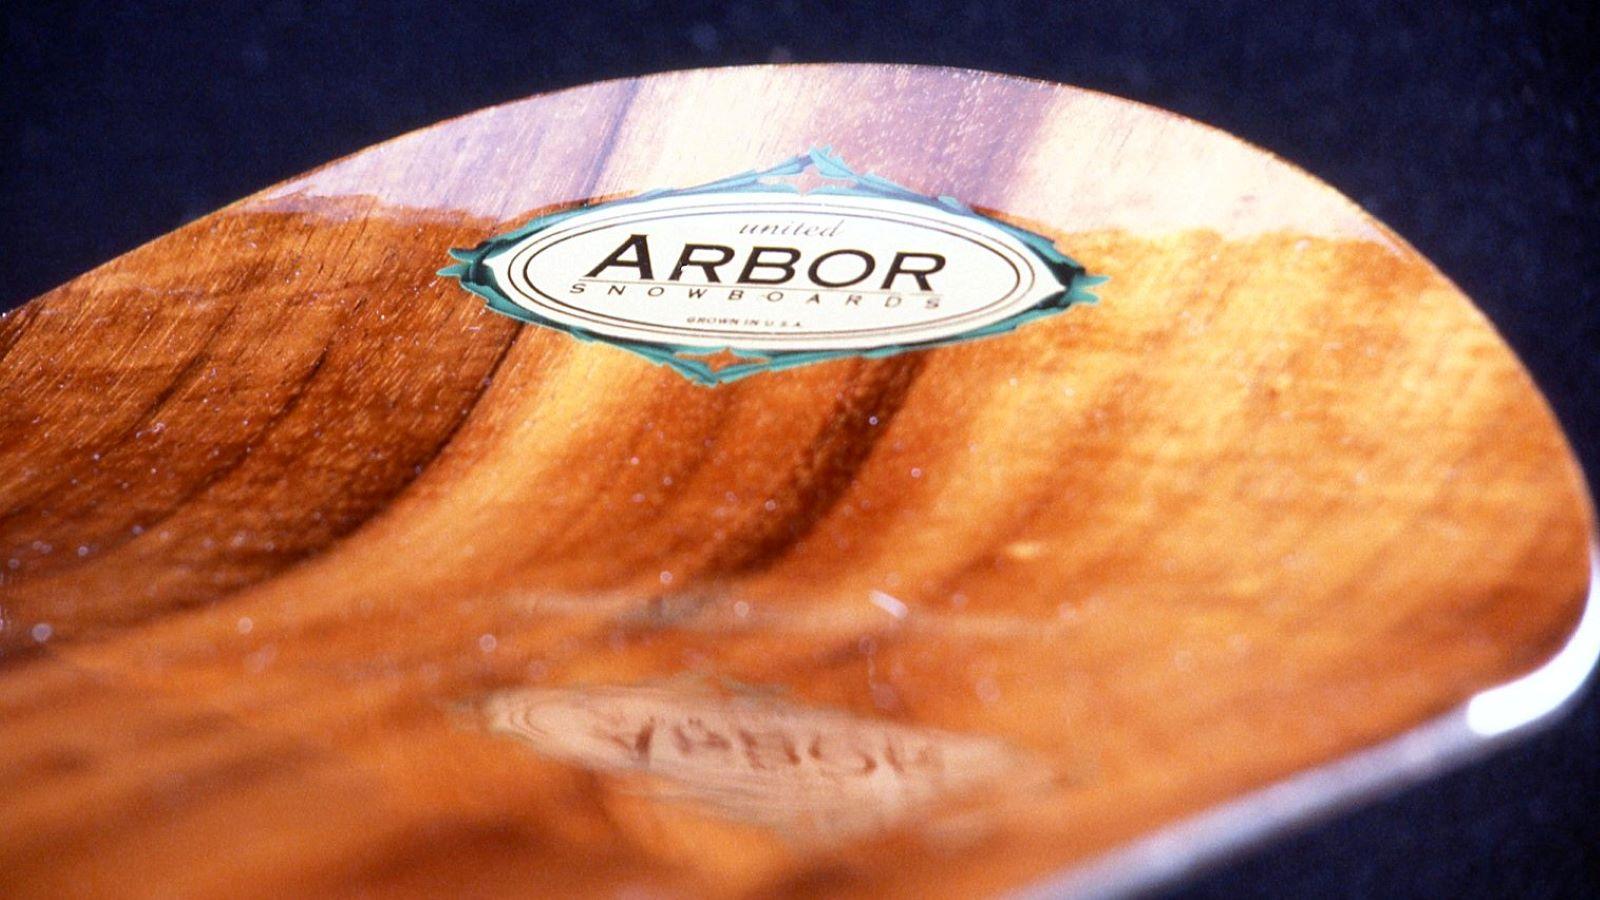 Arbor 1995, First Snowboard